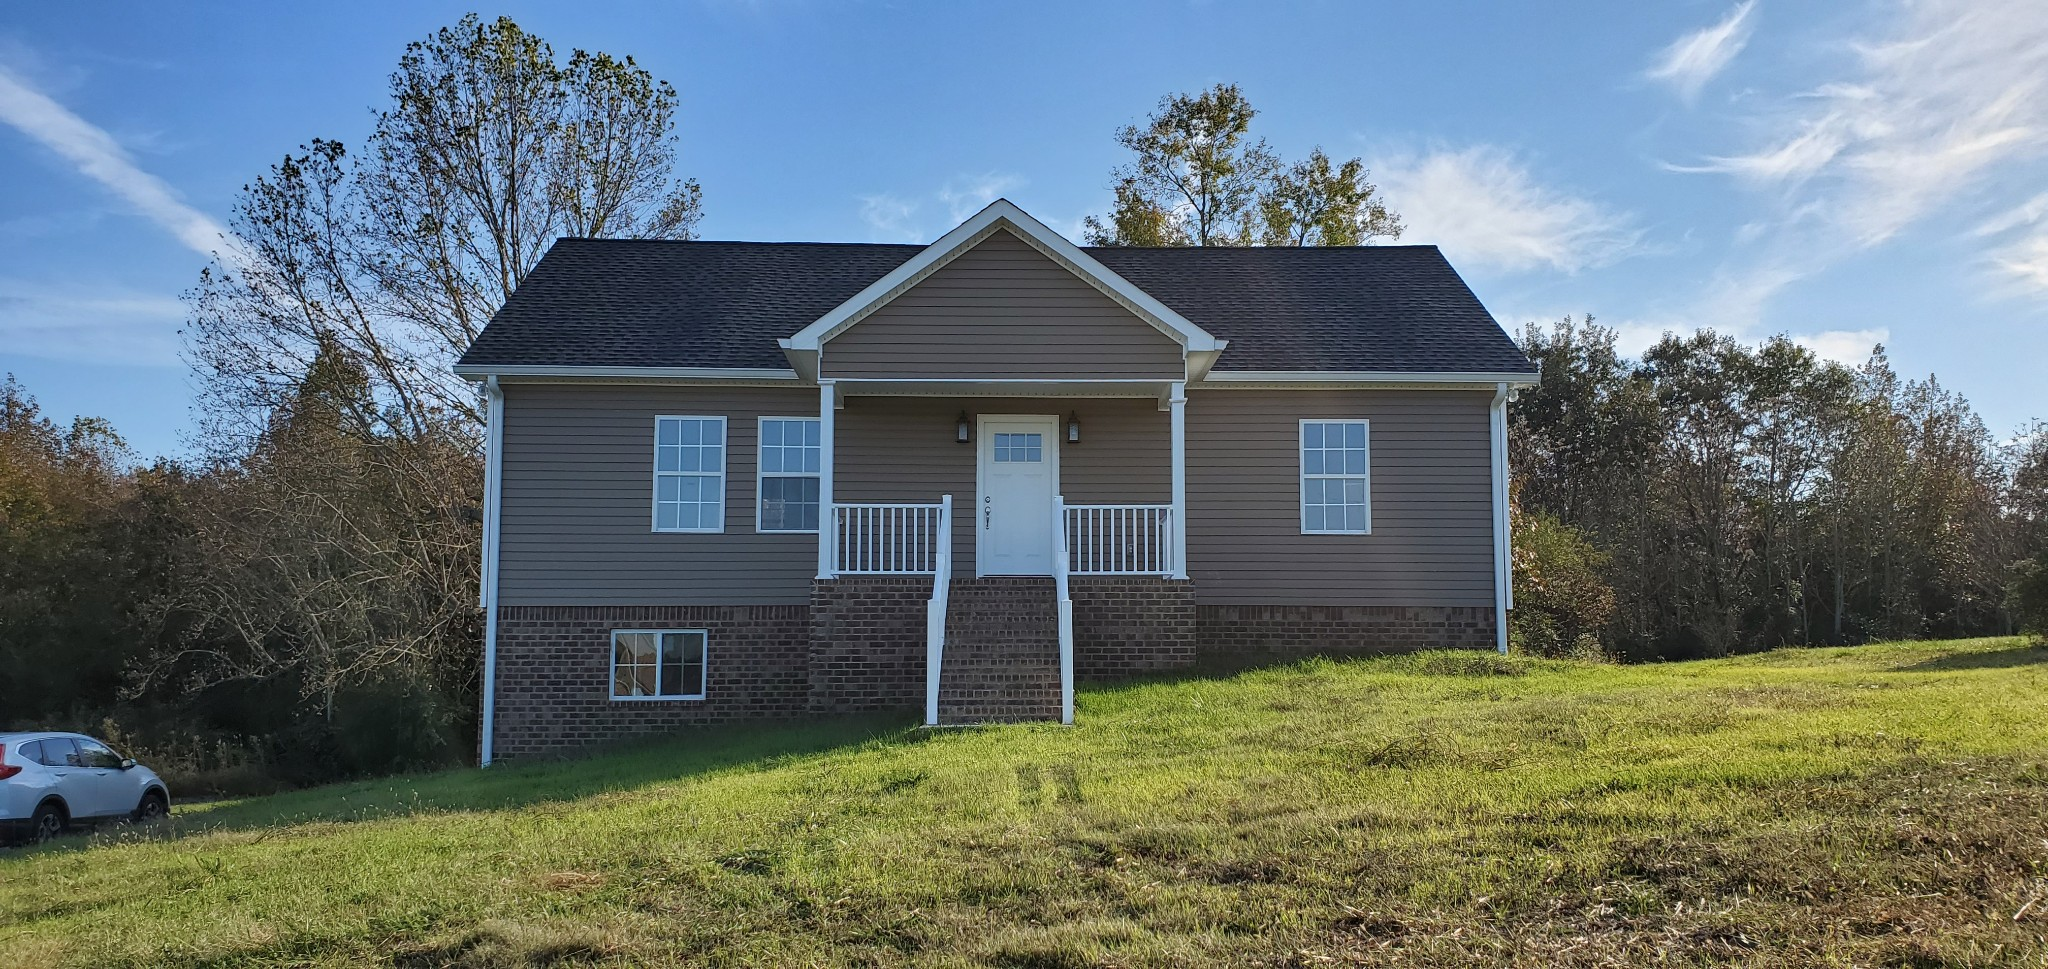 505 Tuck Rd, Lafayette, TN 37083 - Lafayette, TN real estate listing